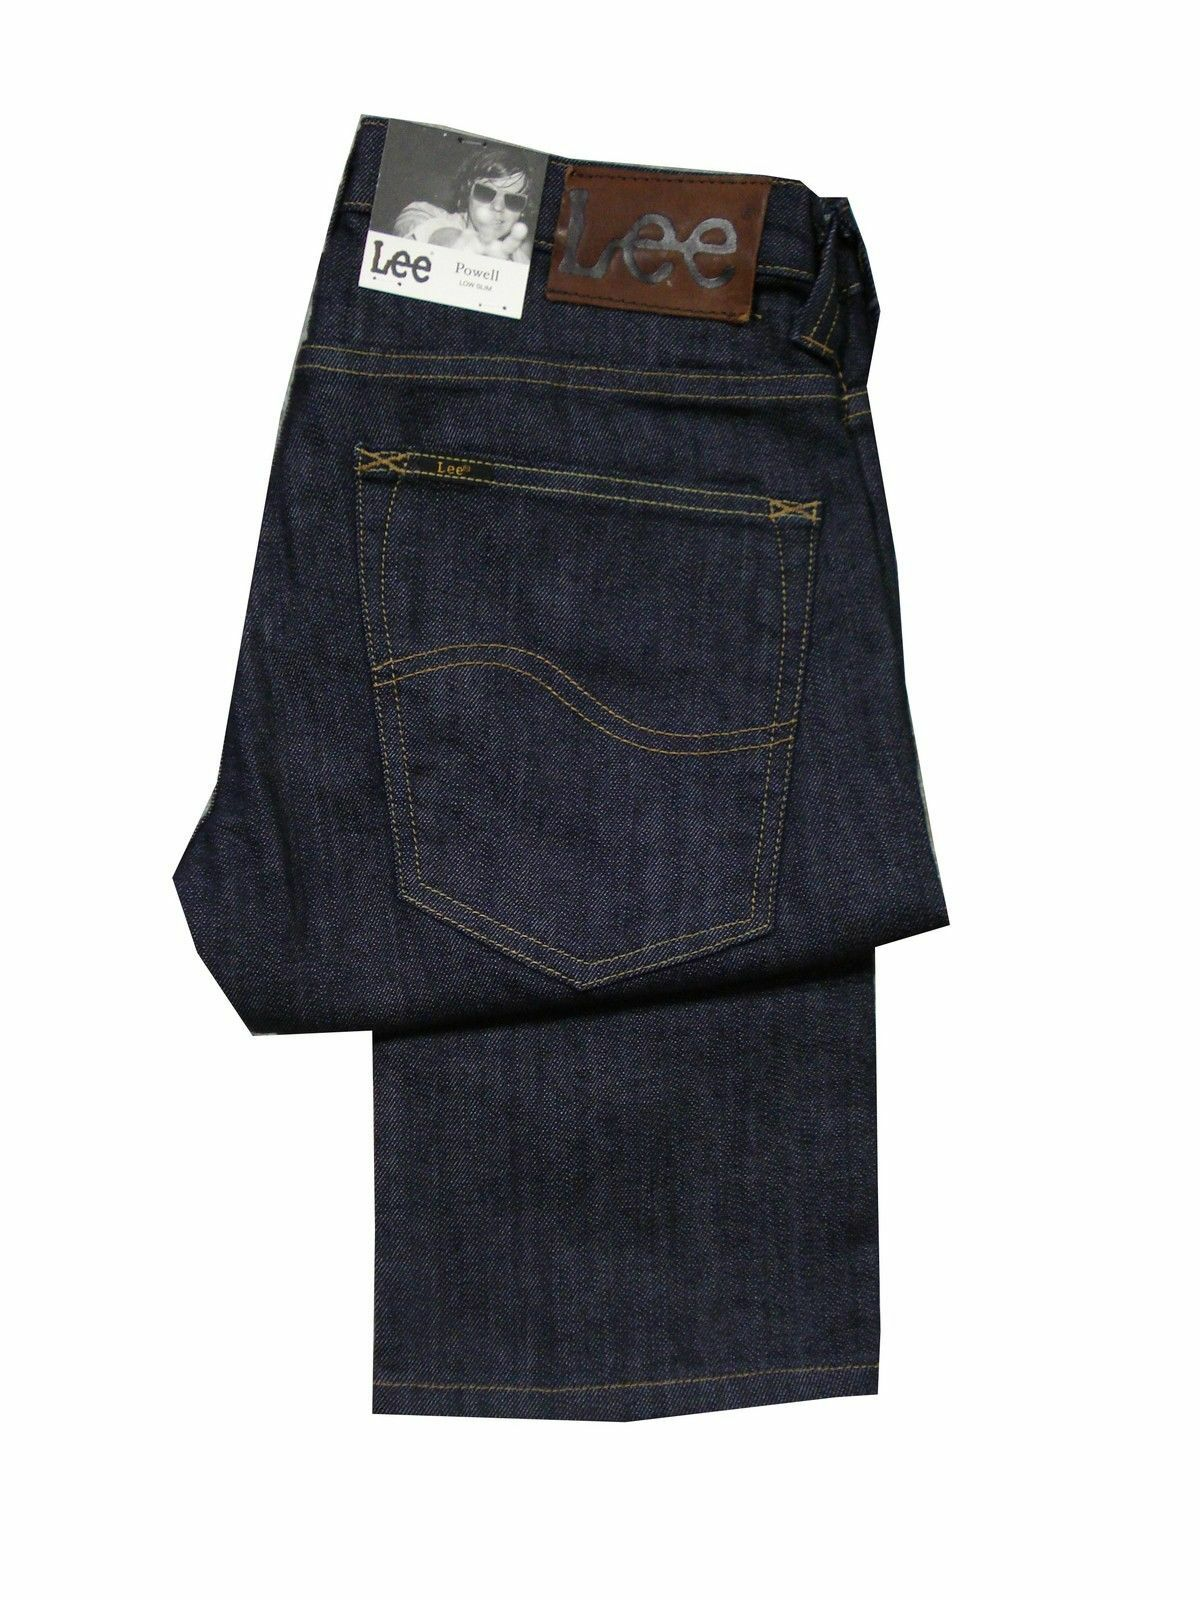 MENS TALL 36 INCH LEG X LONG LEG LEE POWELL SLIM FIT JEAN - DARK INDIGO blueE